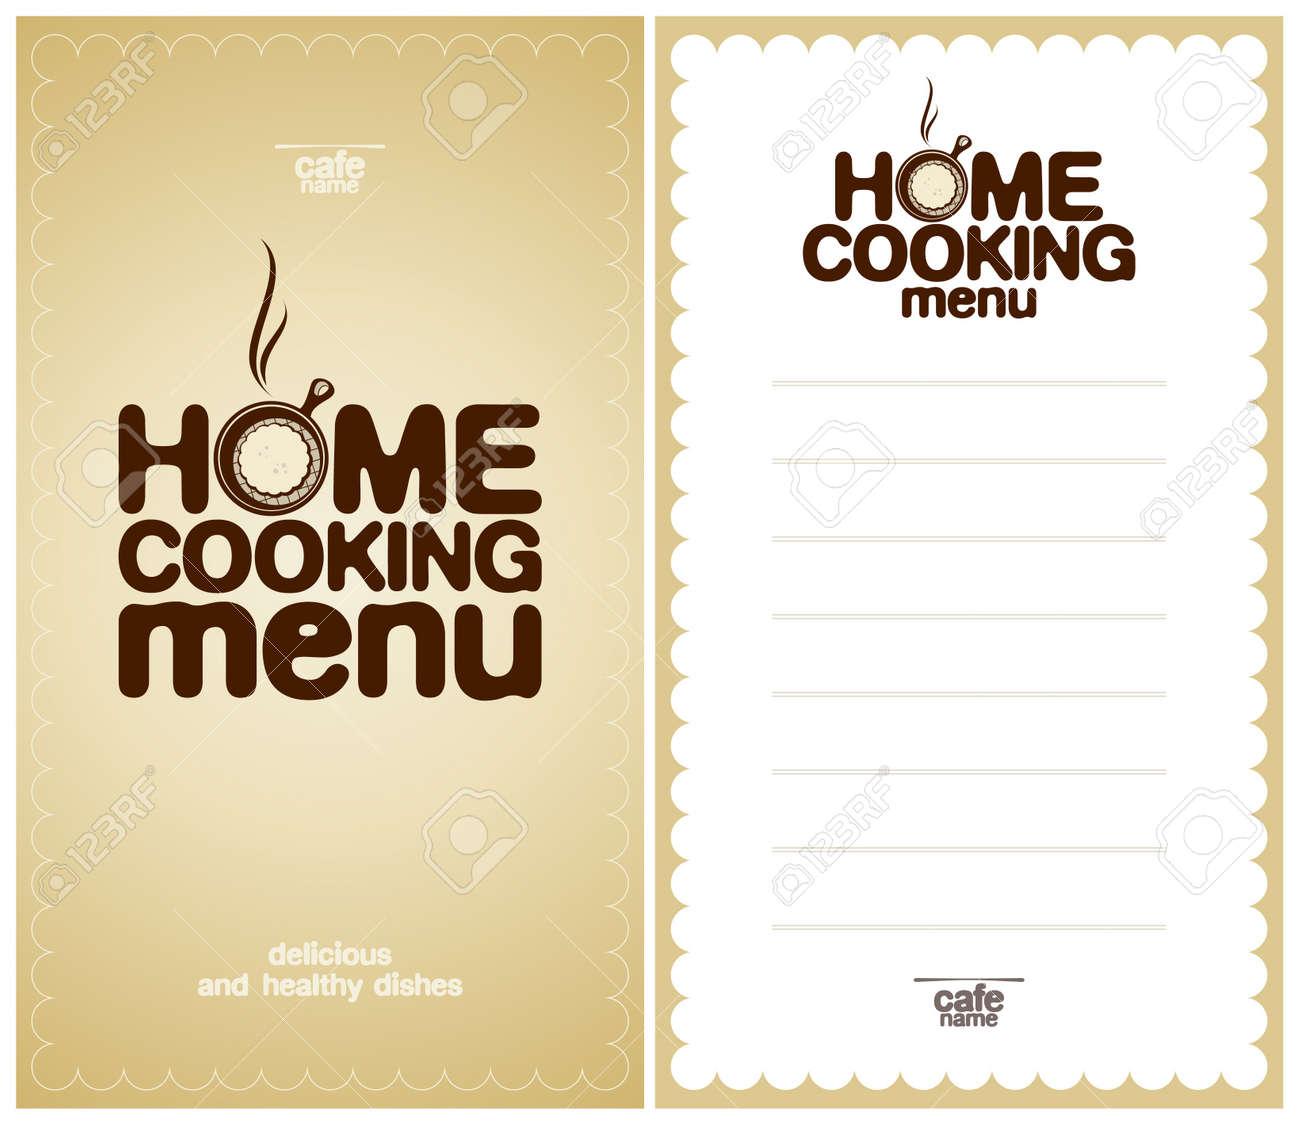 Dedfcdddbcfddfaede unique home menu template mctoom. Com.